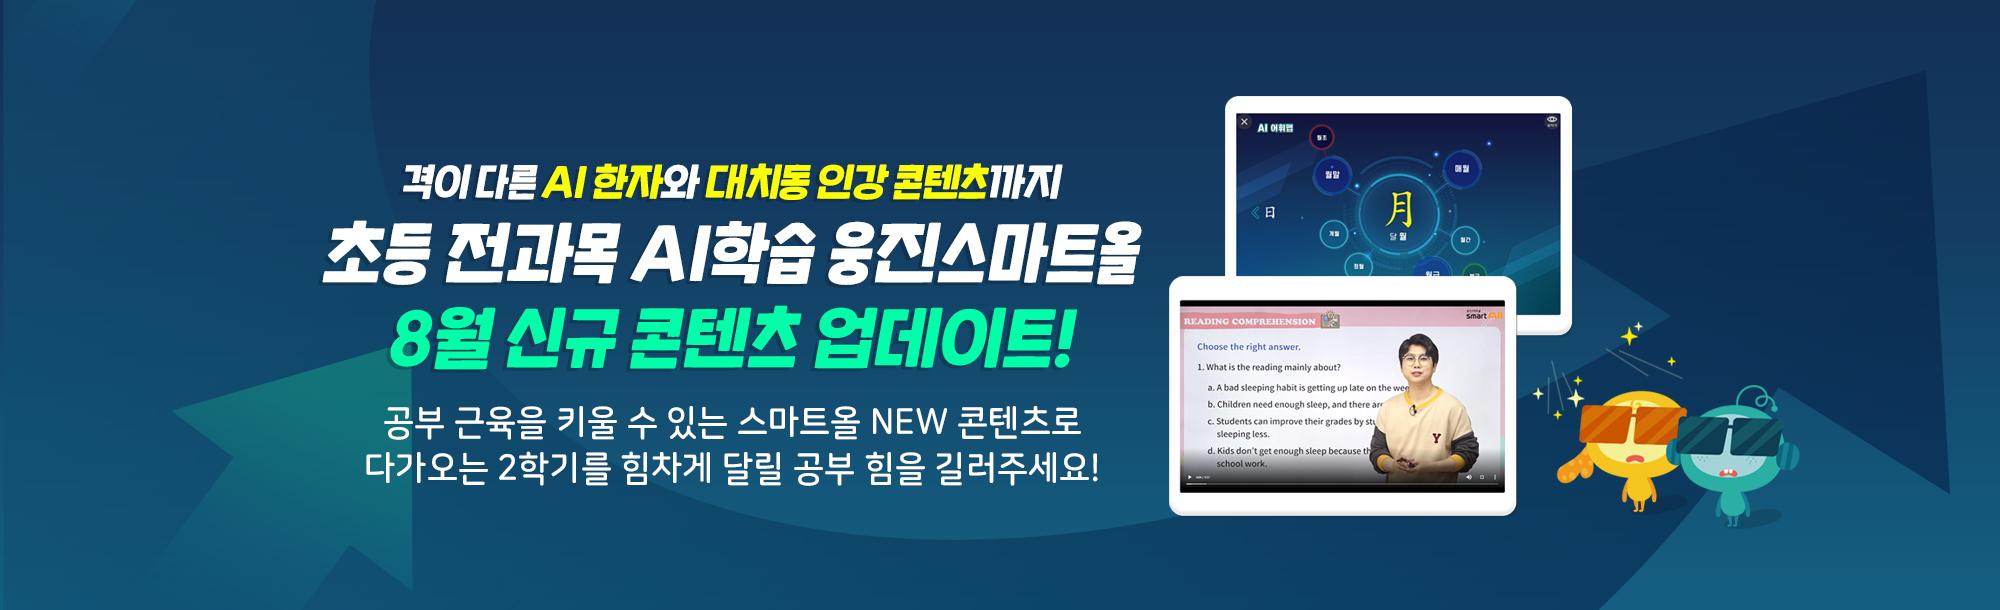 AI한자와 대치동 인강 콘텐츠까지! 8월 신규 콘텐츠 업데이트!